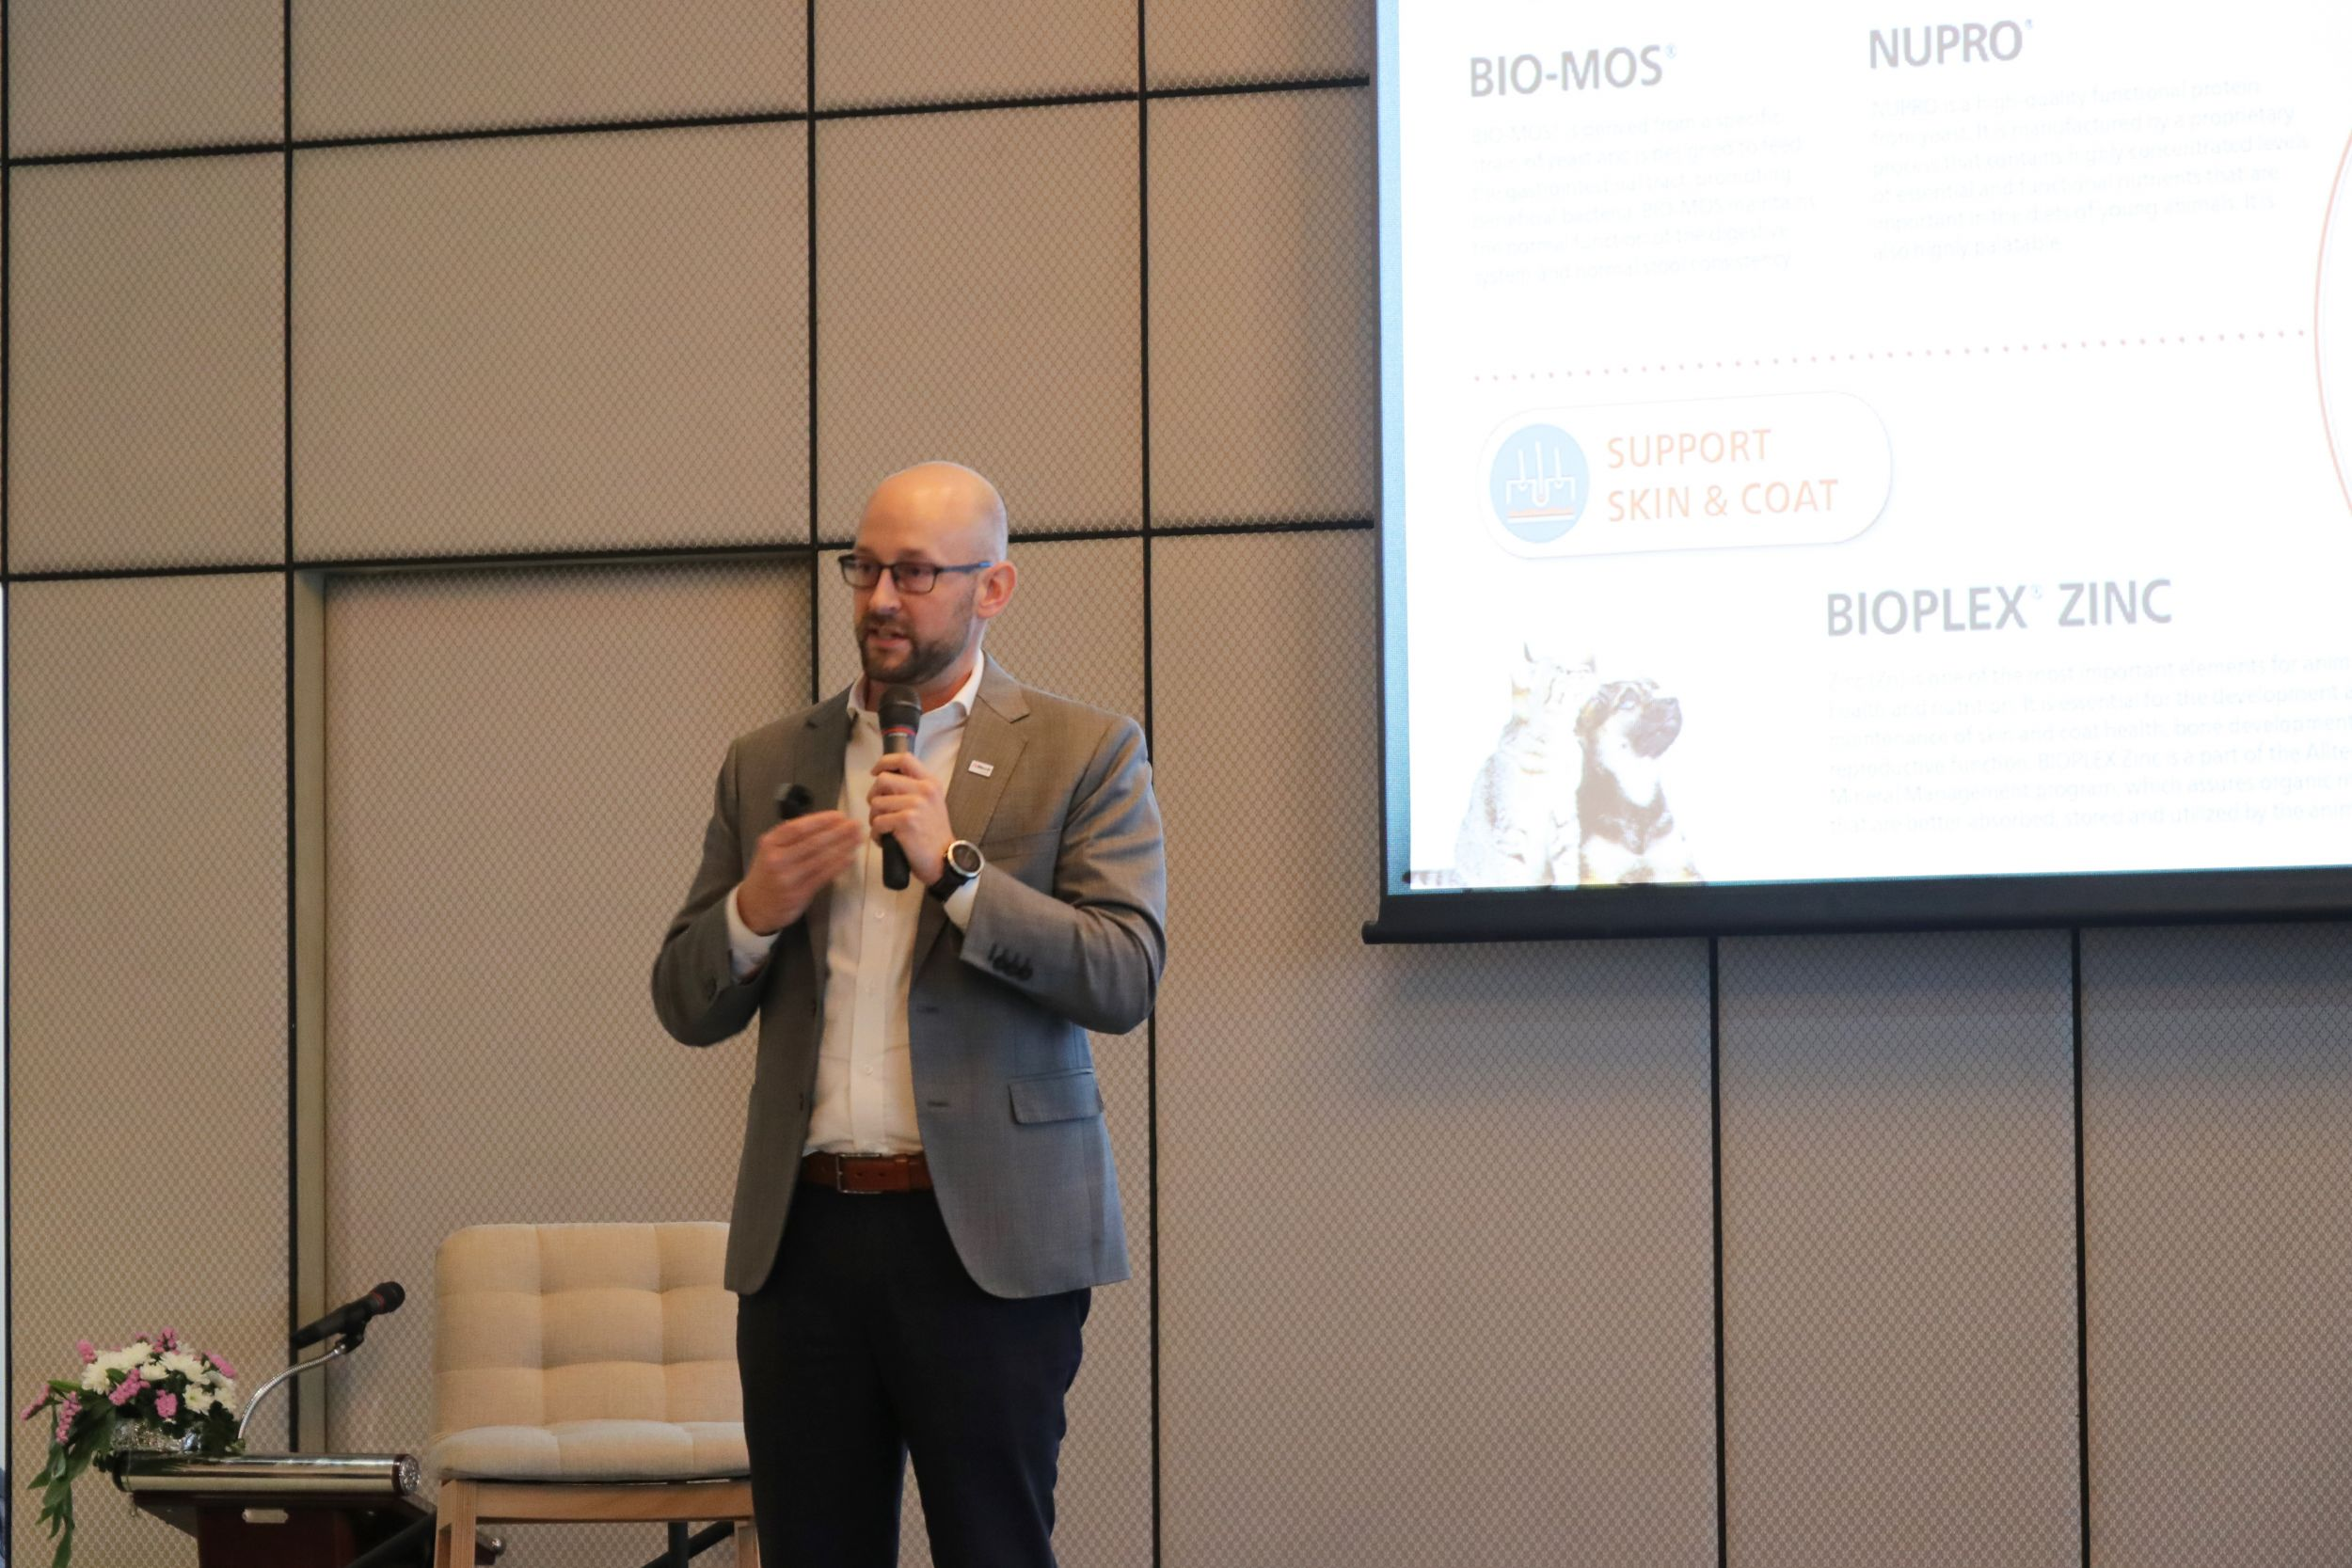 Dogilike.com :: วีเอ็นยูฯ ก้าวสู่อุตสาหกรรมสัตว์เลี้ยง พร้อมผลักดันการเจรจาธุรกิจครบวงจรสำหรับ SEA